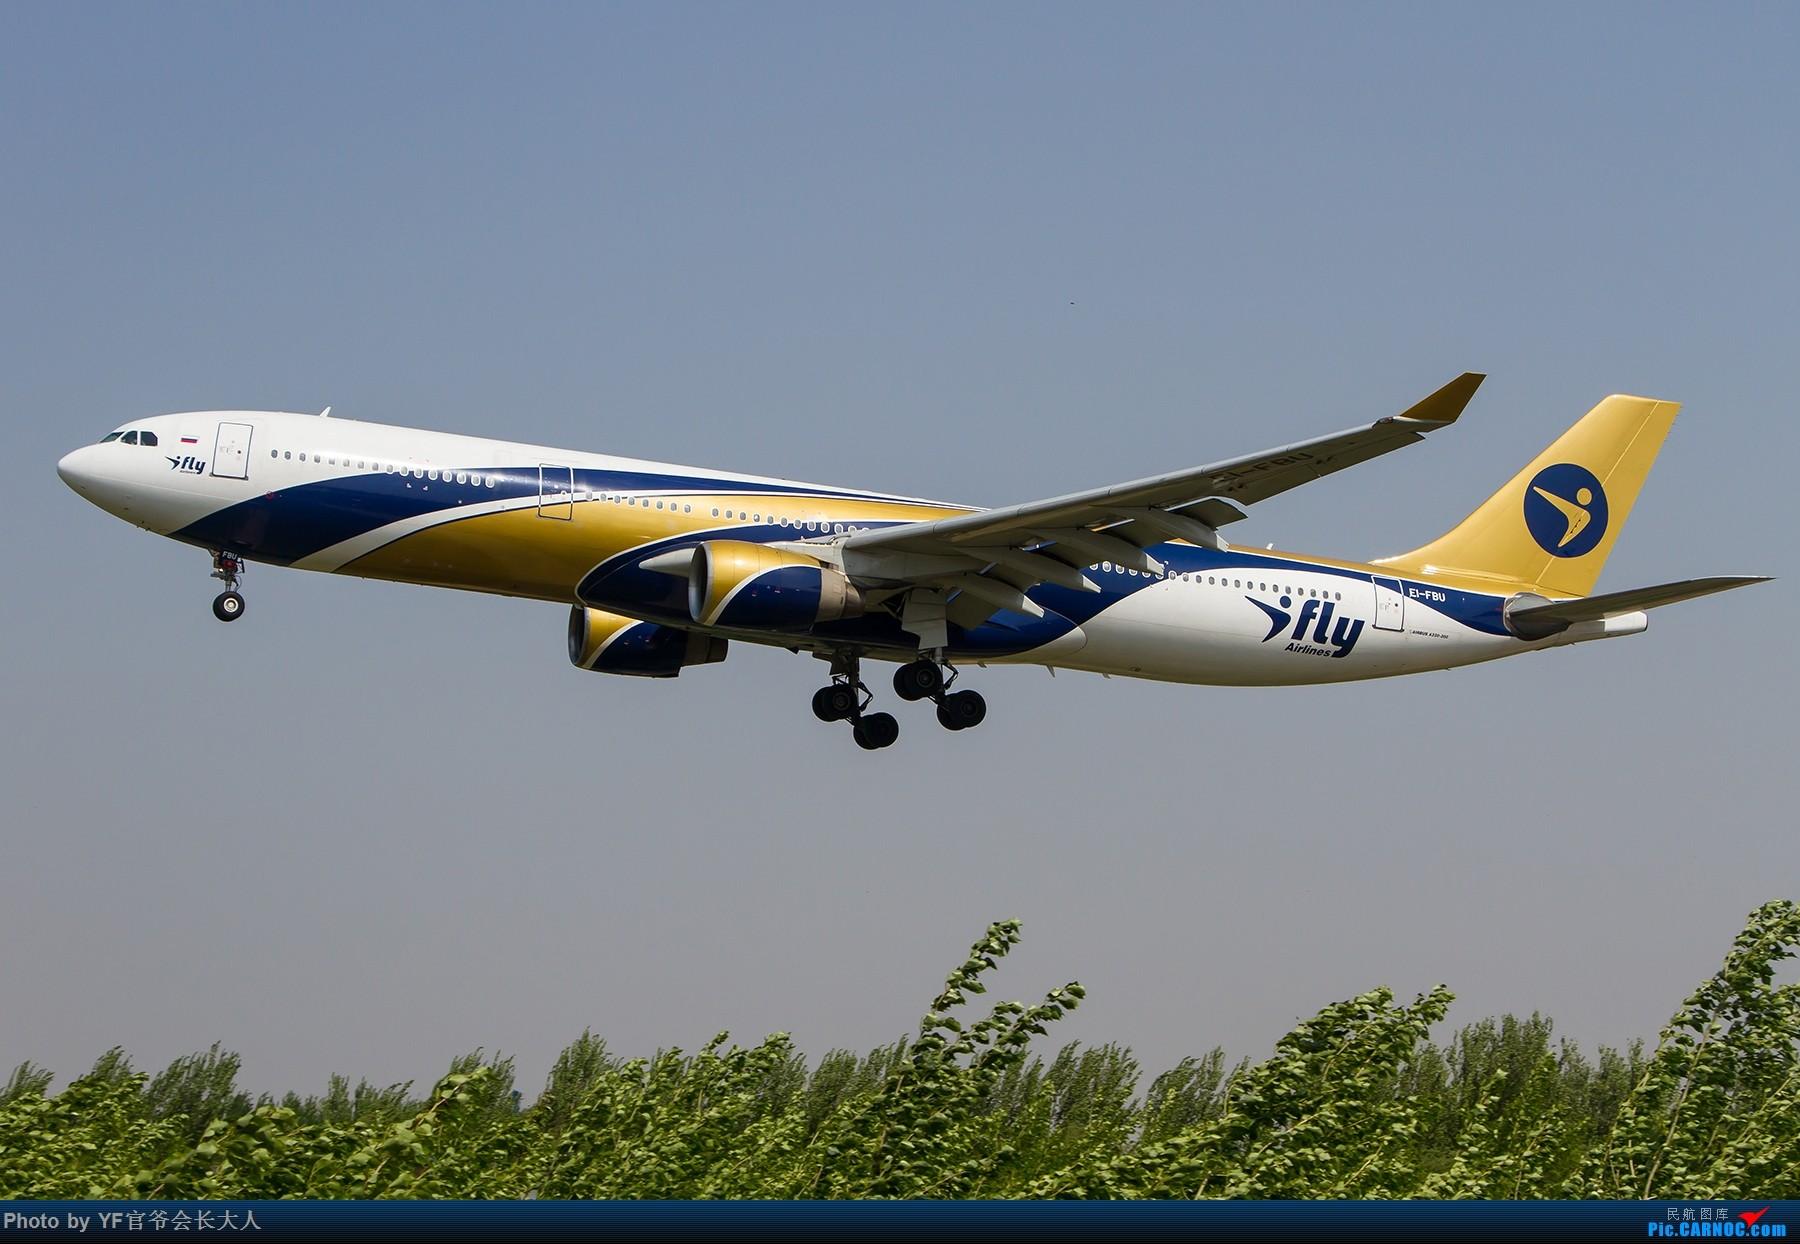 Re:[原创]【ZYTX】轻易不拍机,拍就要拍个过瘾!(新开的酷鸟,亚洲大西洋,顺带碰上朝韩两国的好货) AIRBUS A330-300 EI-FBU 中国沈阳桃仙国际机场